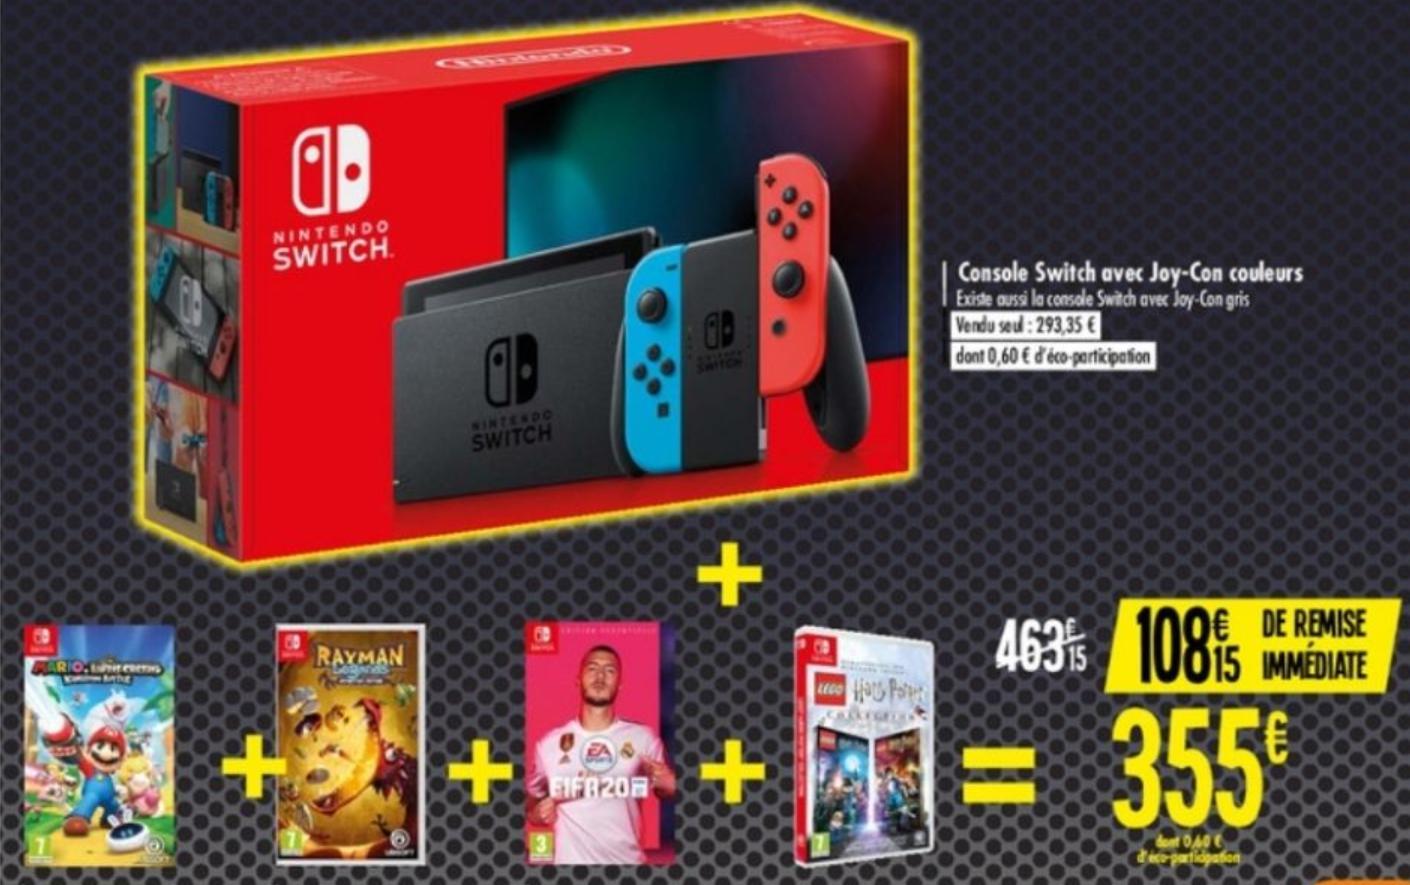 Console Nintendo Switch (2019) + Mario et les lapins crétins + Rayman Legend + Lego Harry Potter + FIFA 20